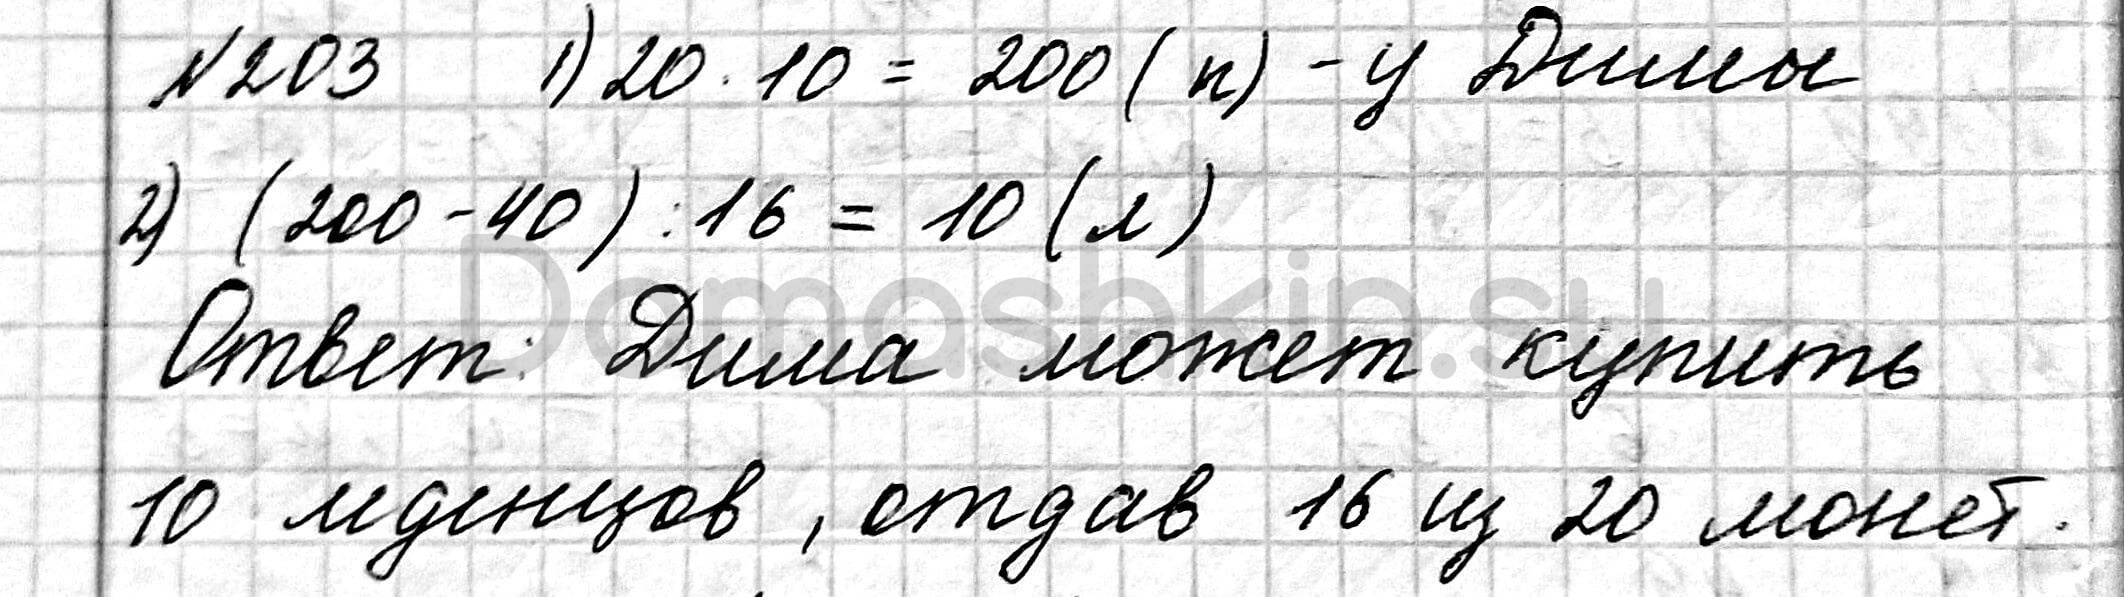 Математика 6 класс учебник Мерзляк номер 203 решение